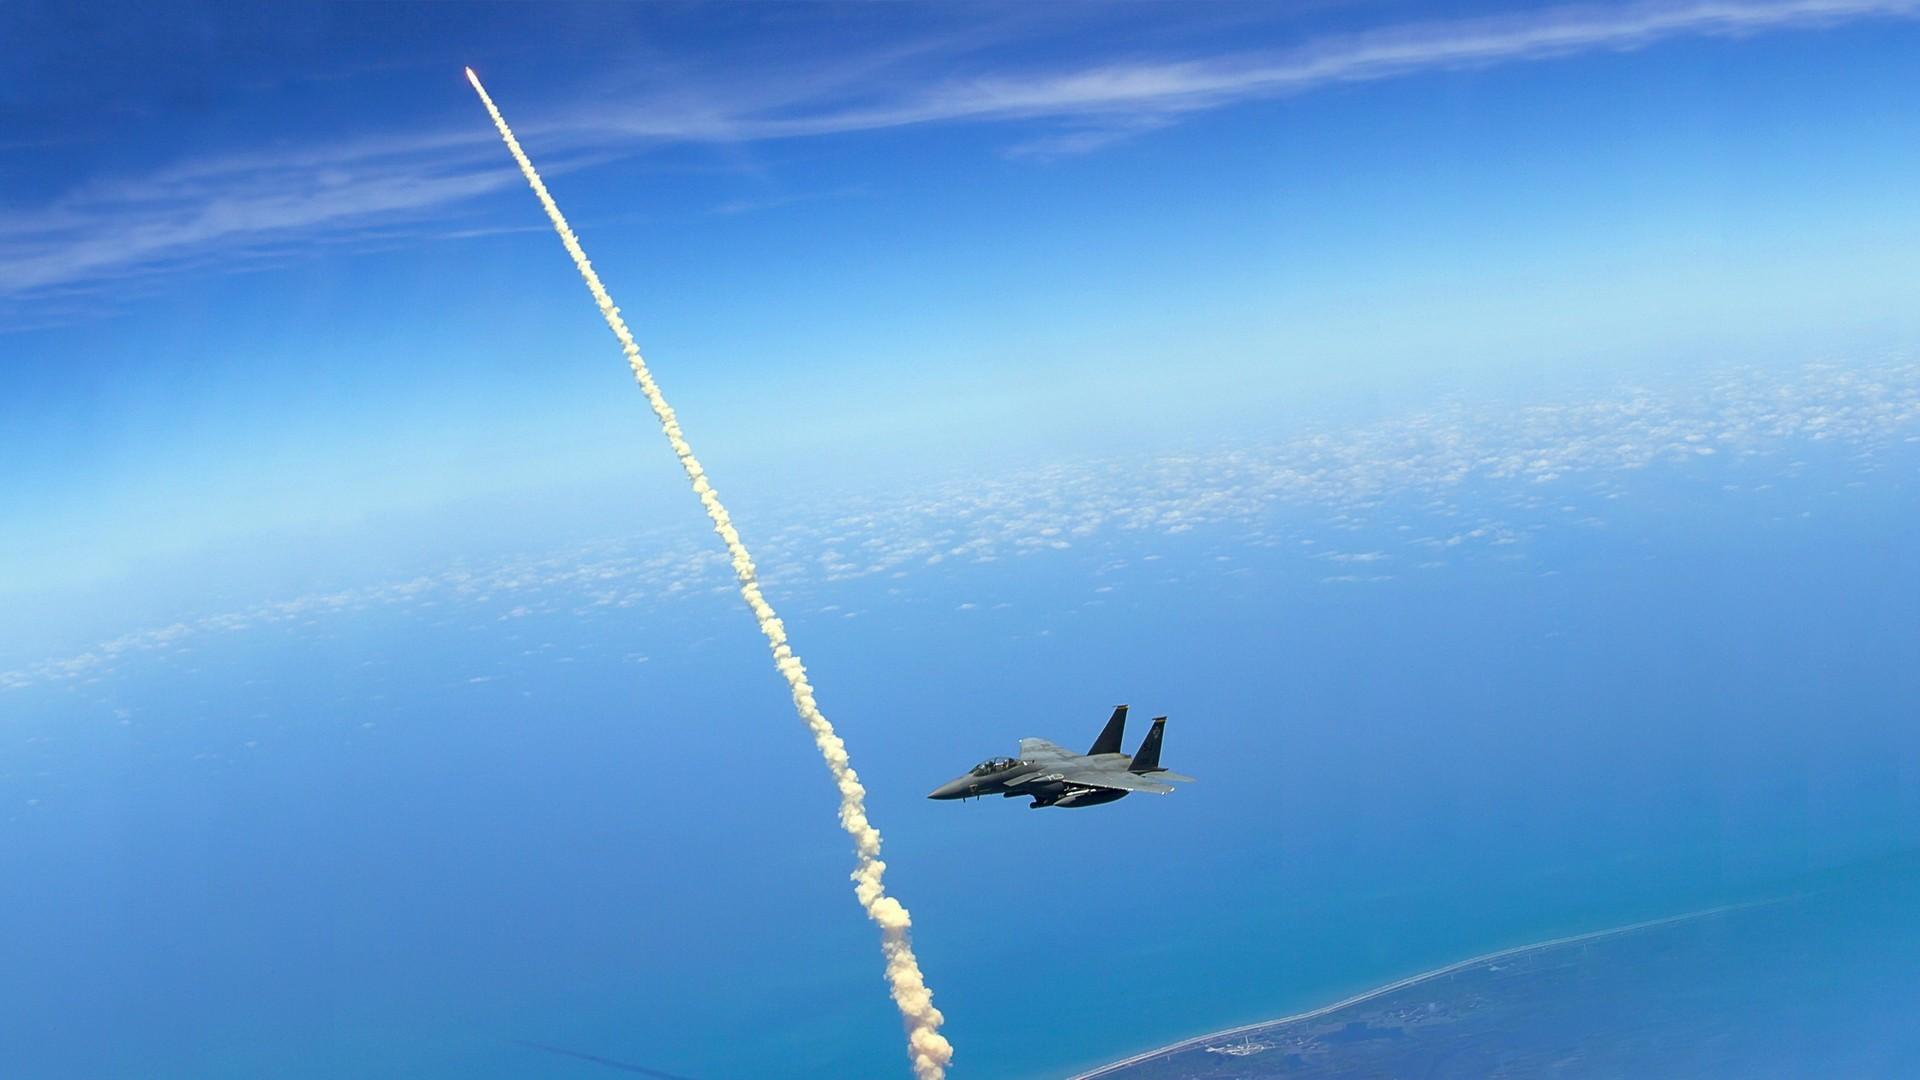 Самолет ракета картинки